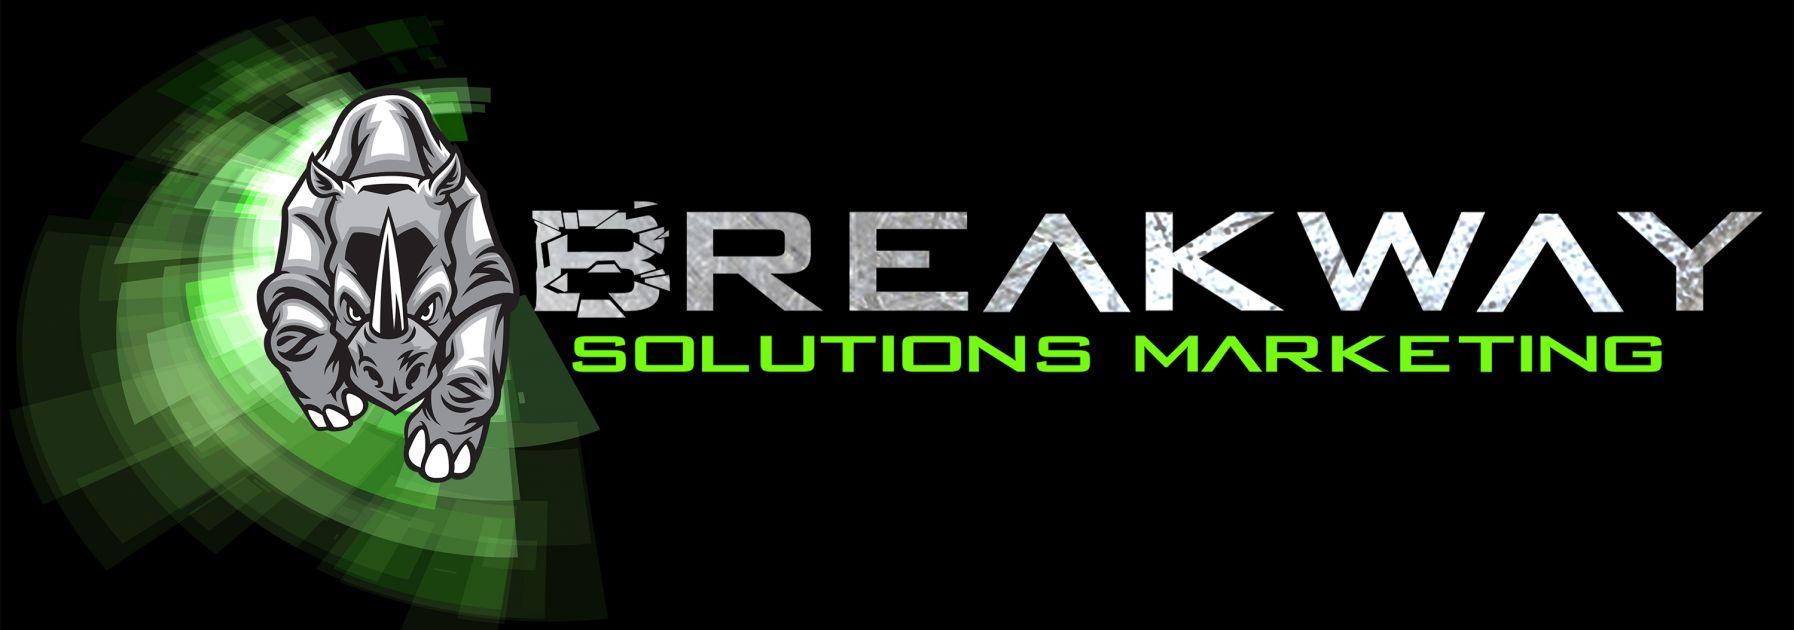 Breakway Solutions Marketing Inc Logo